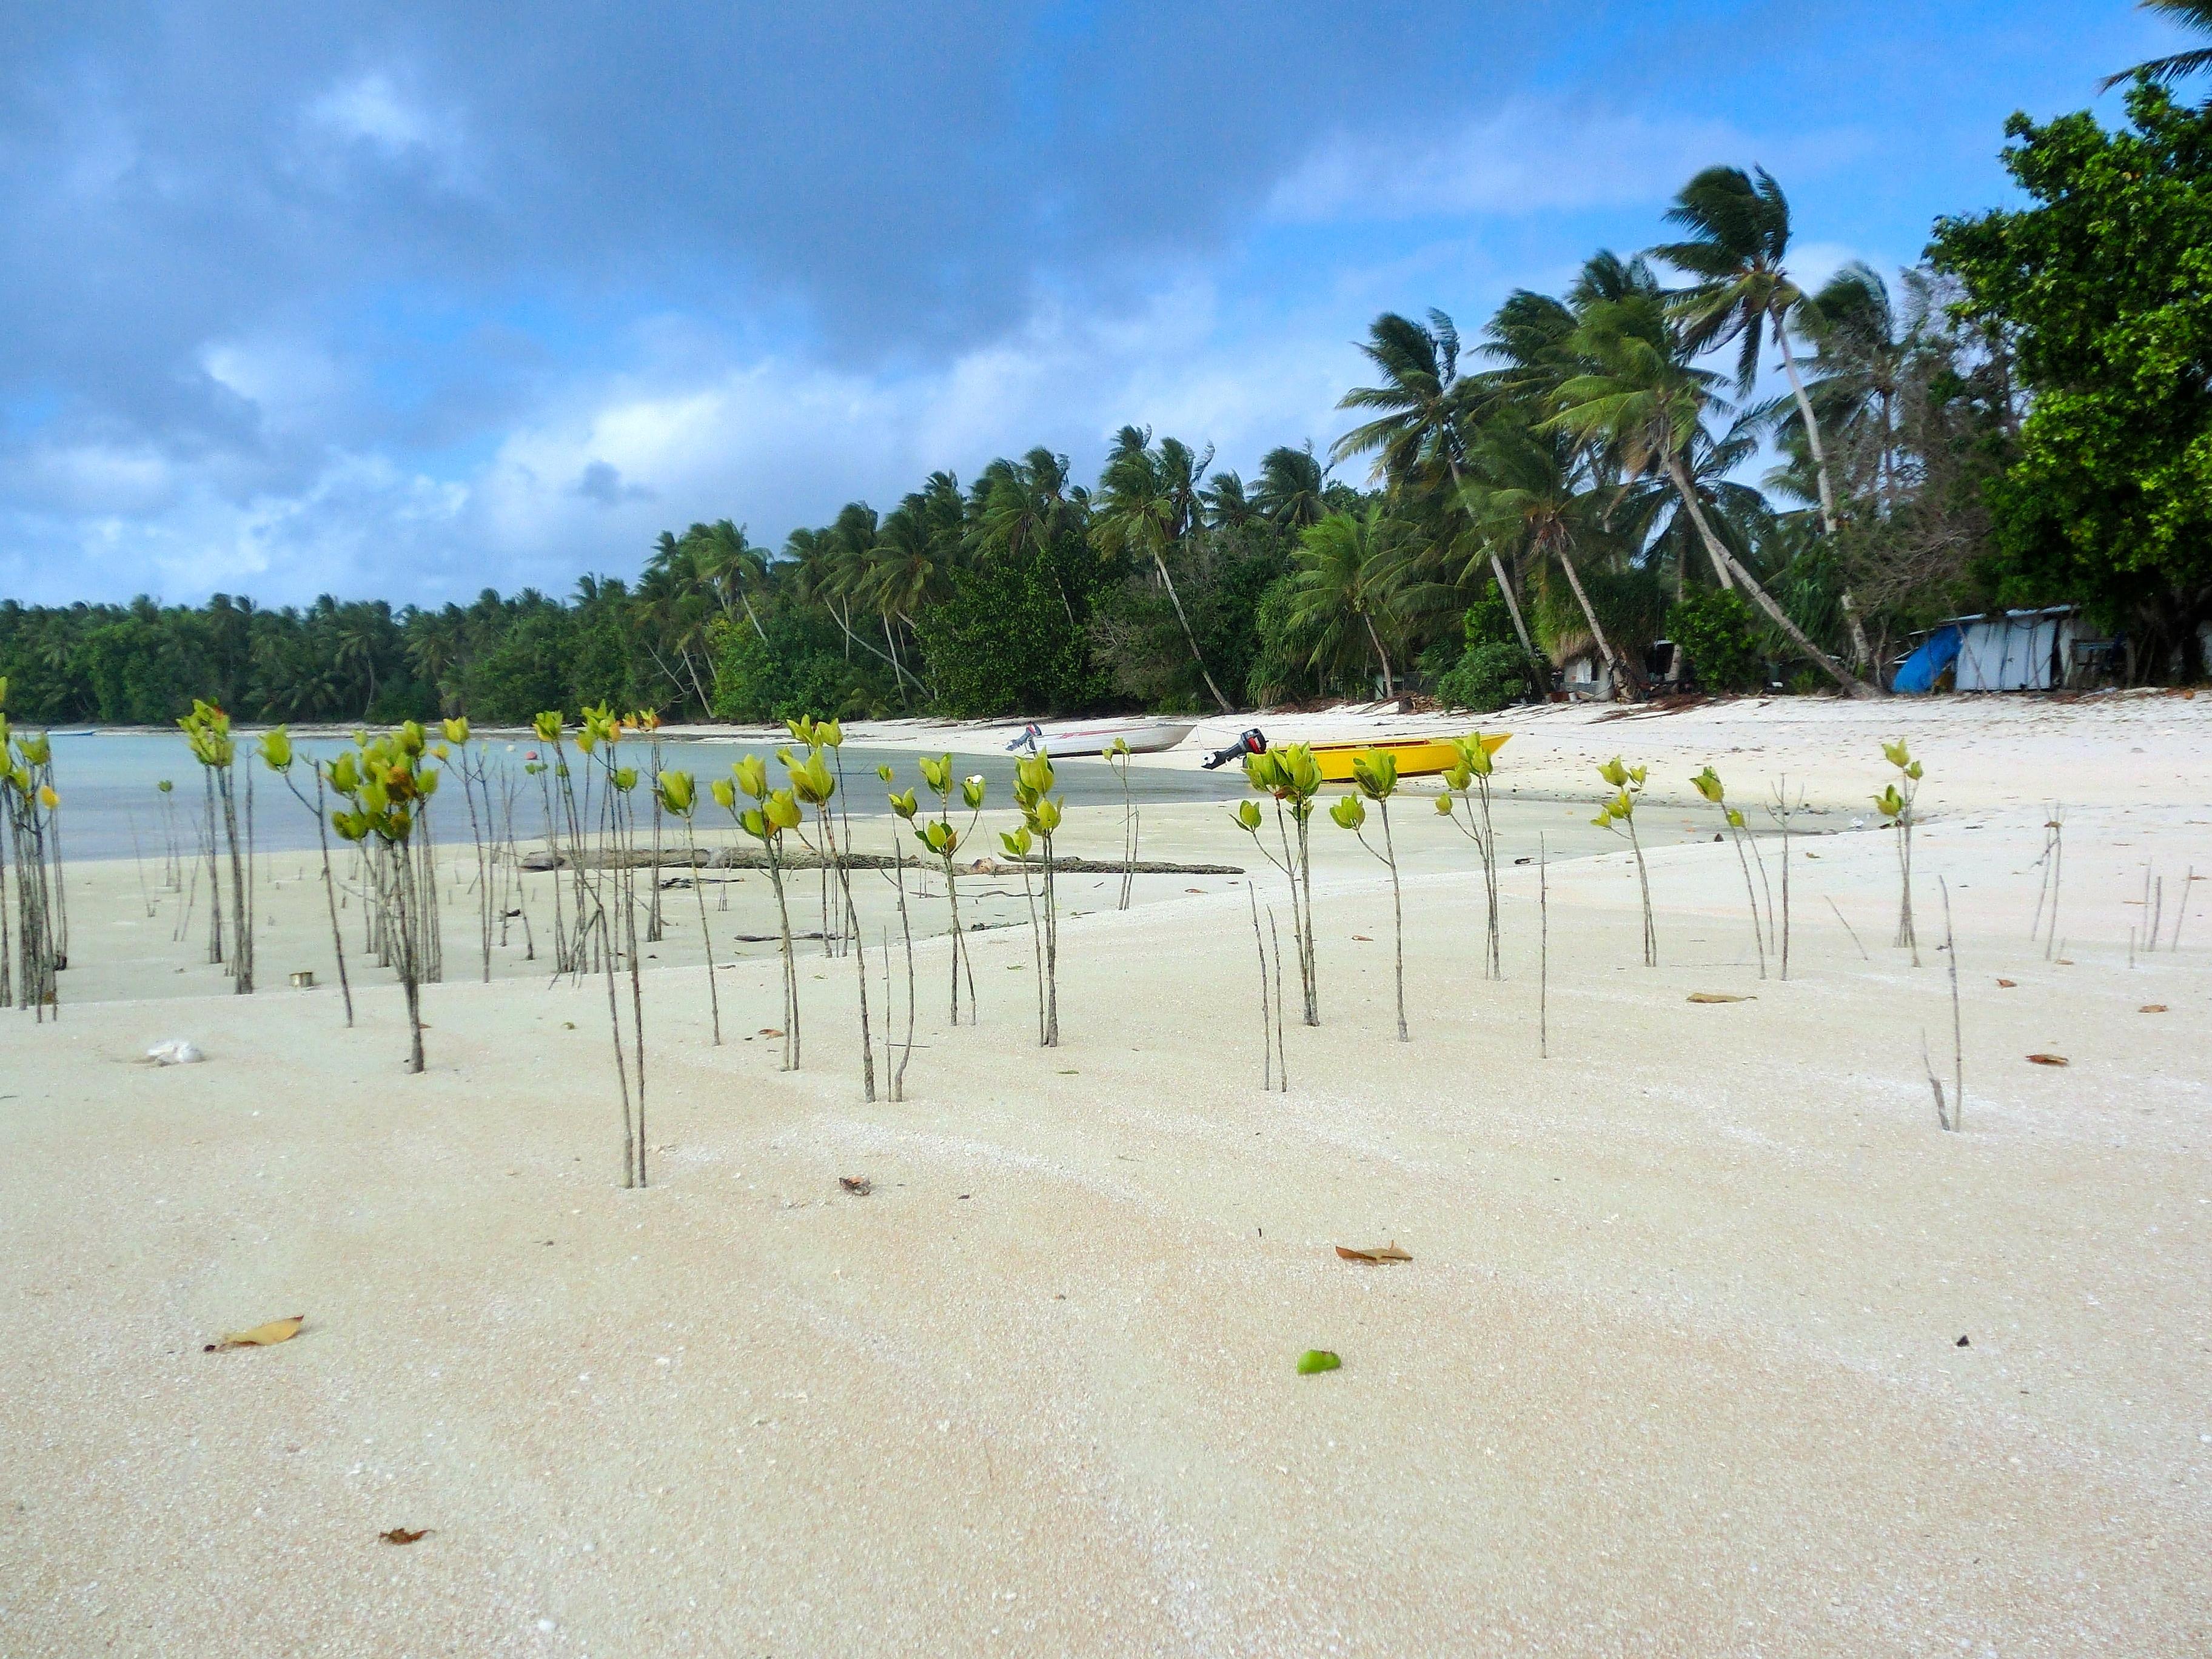 Shifting Tuvalu Civil Society to the Virtual World